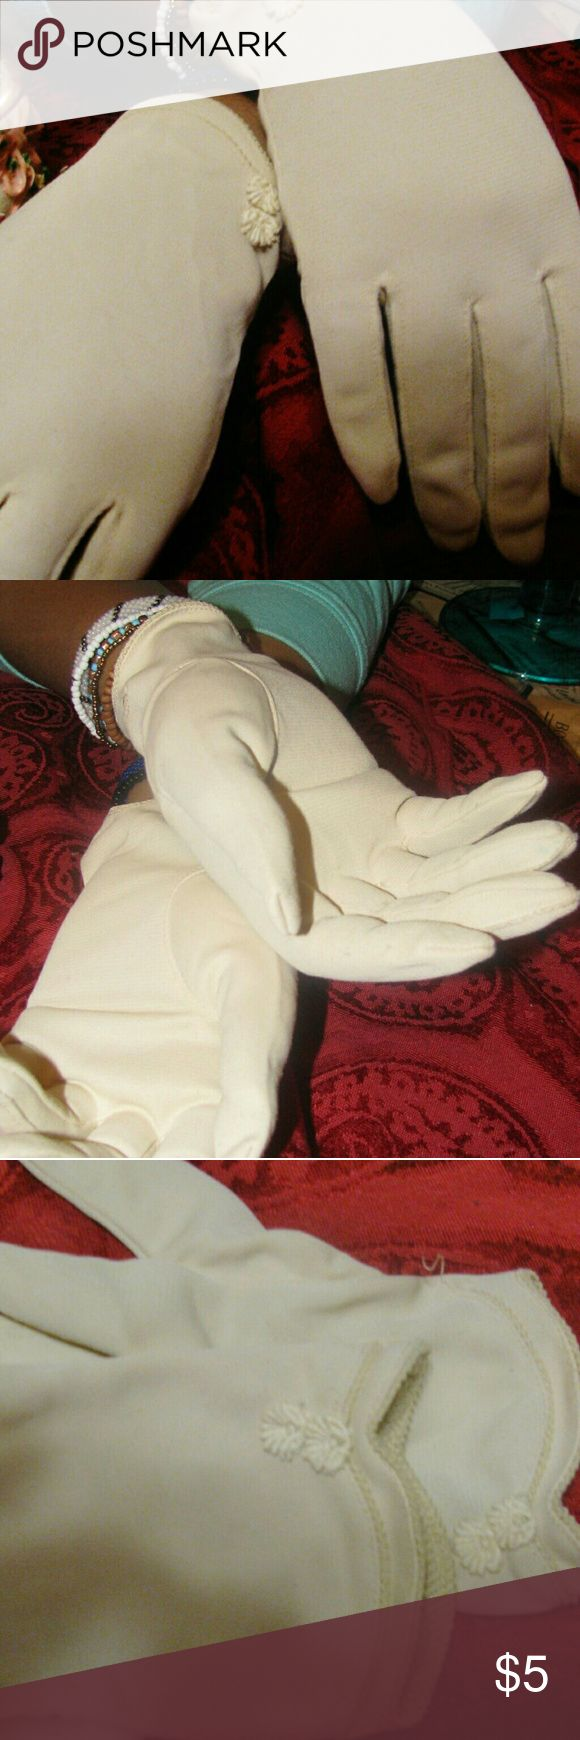 Wrist vintage Ladies gloves Cream wrist gloves for med hands, flower with lace edge stitches Accessories Gloves & Mittens